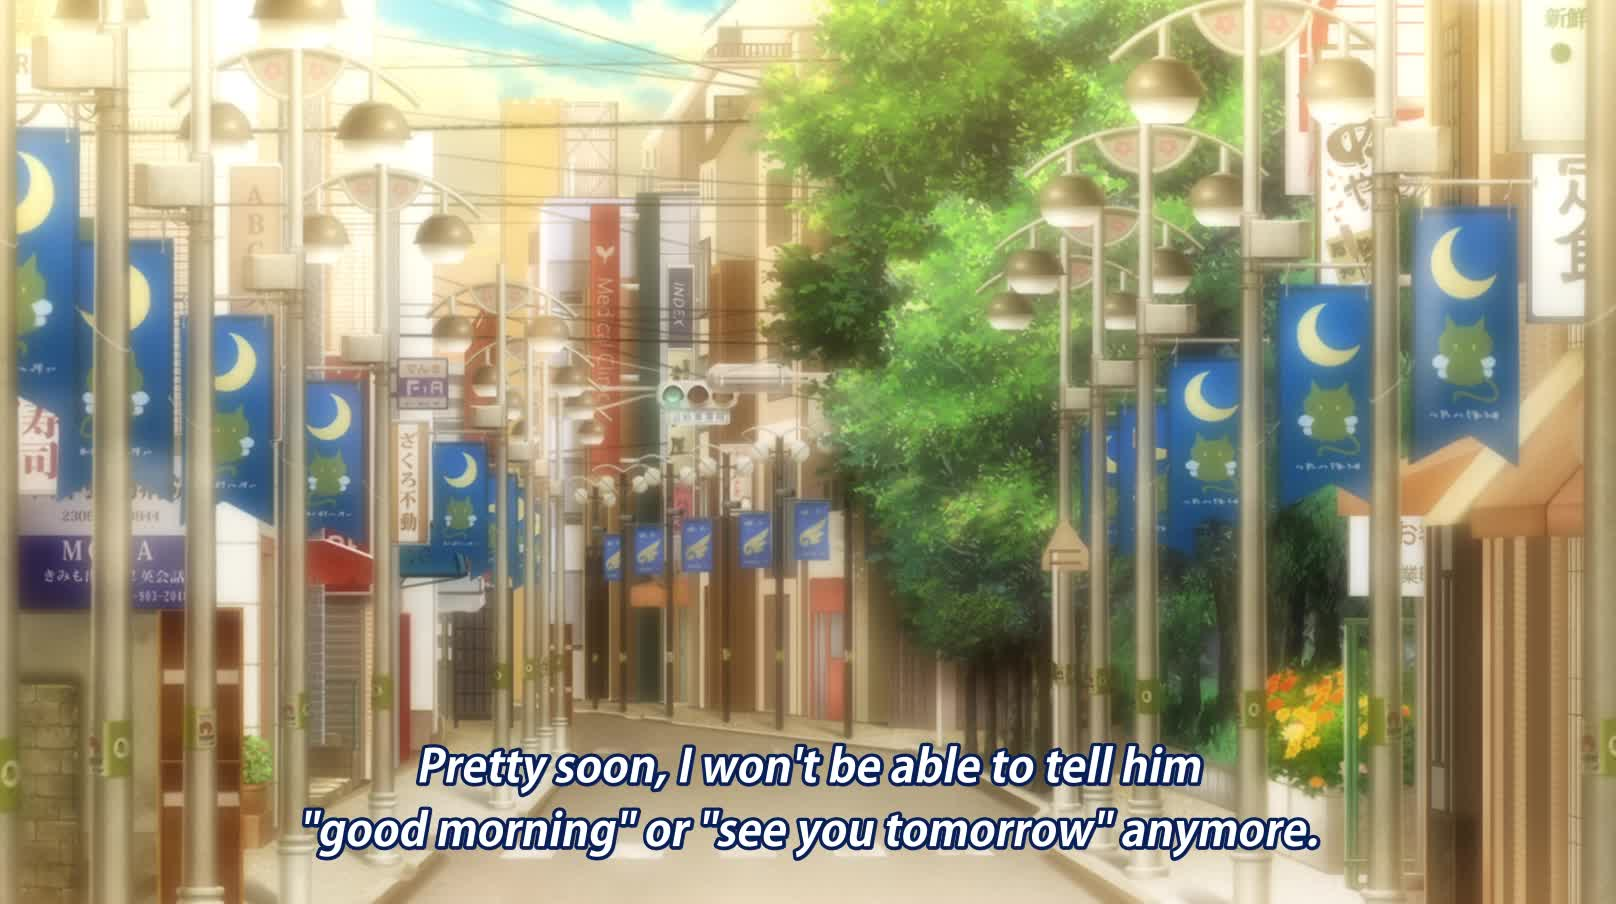 Nisekoi S02E11 (15) GIFs